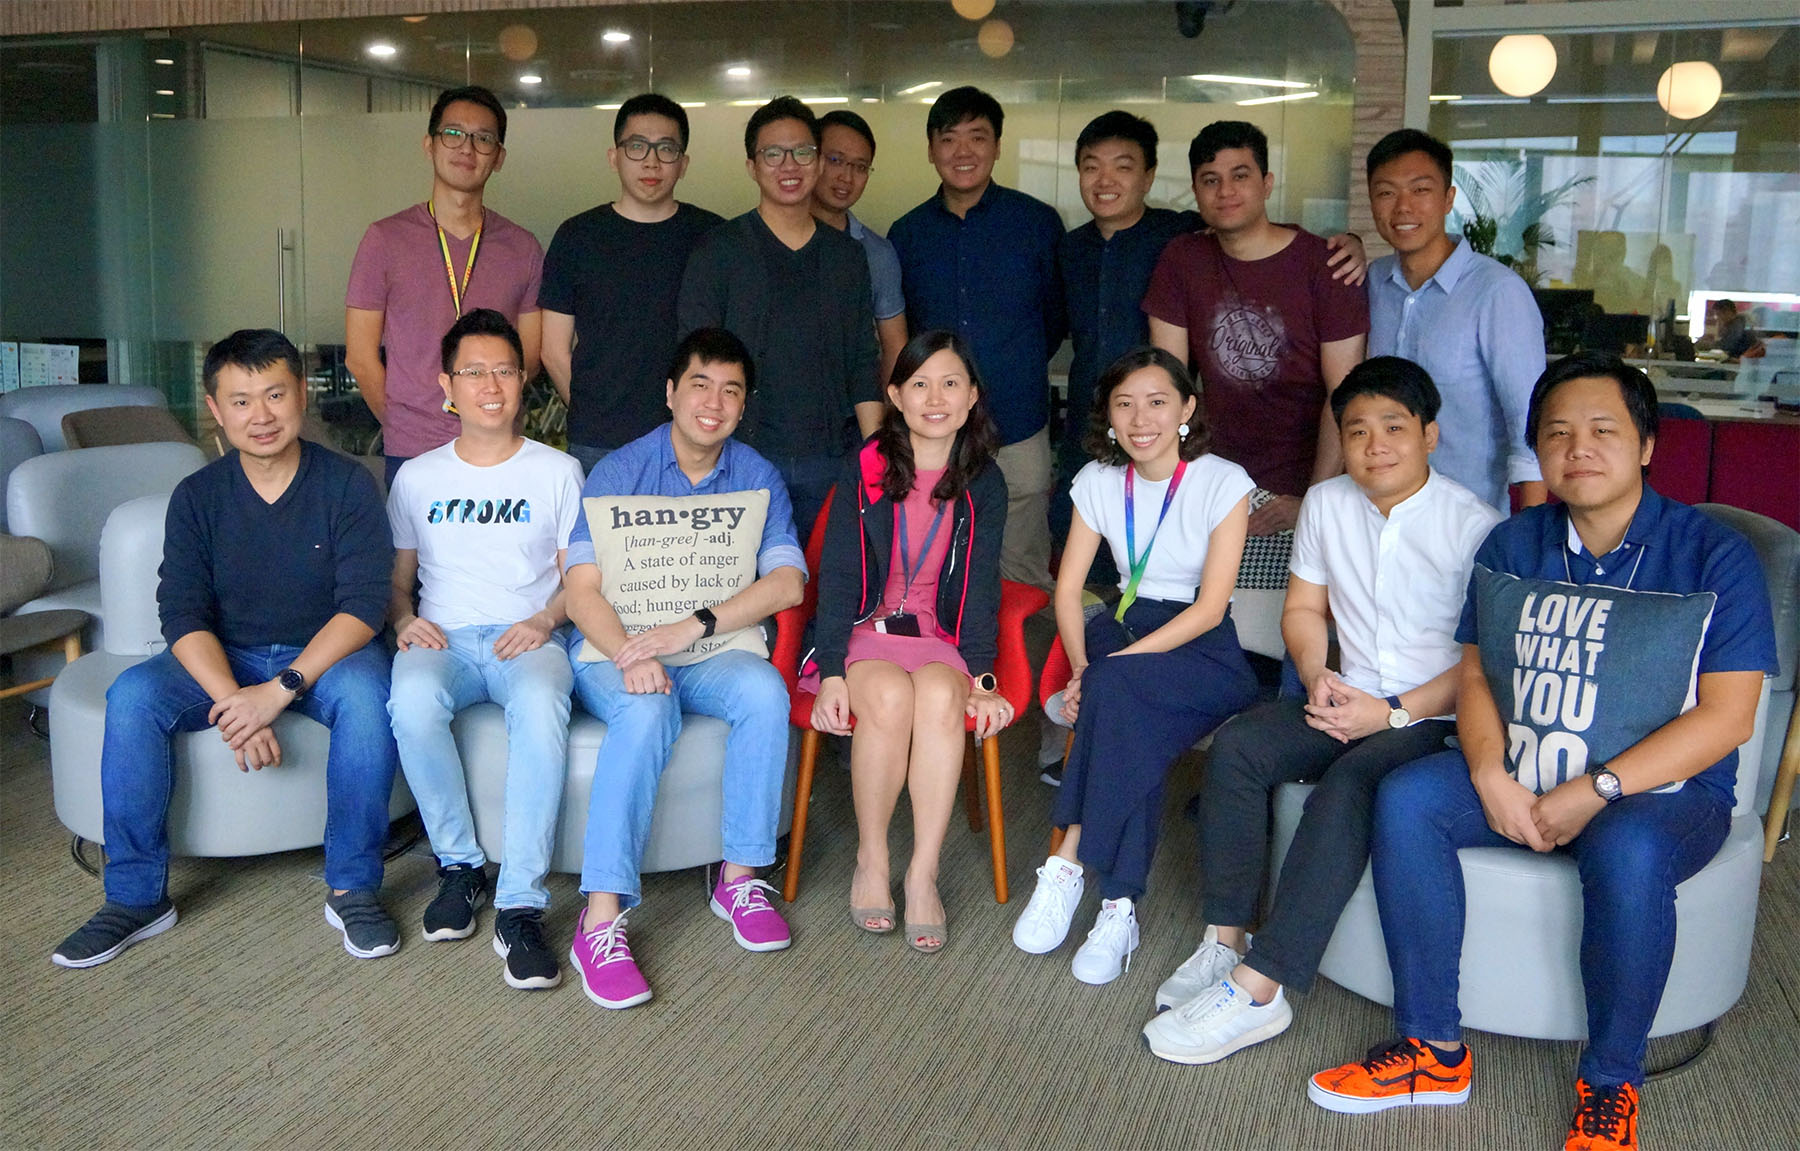 The GovTech MaskGoWhere team